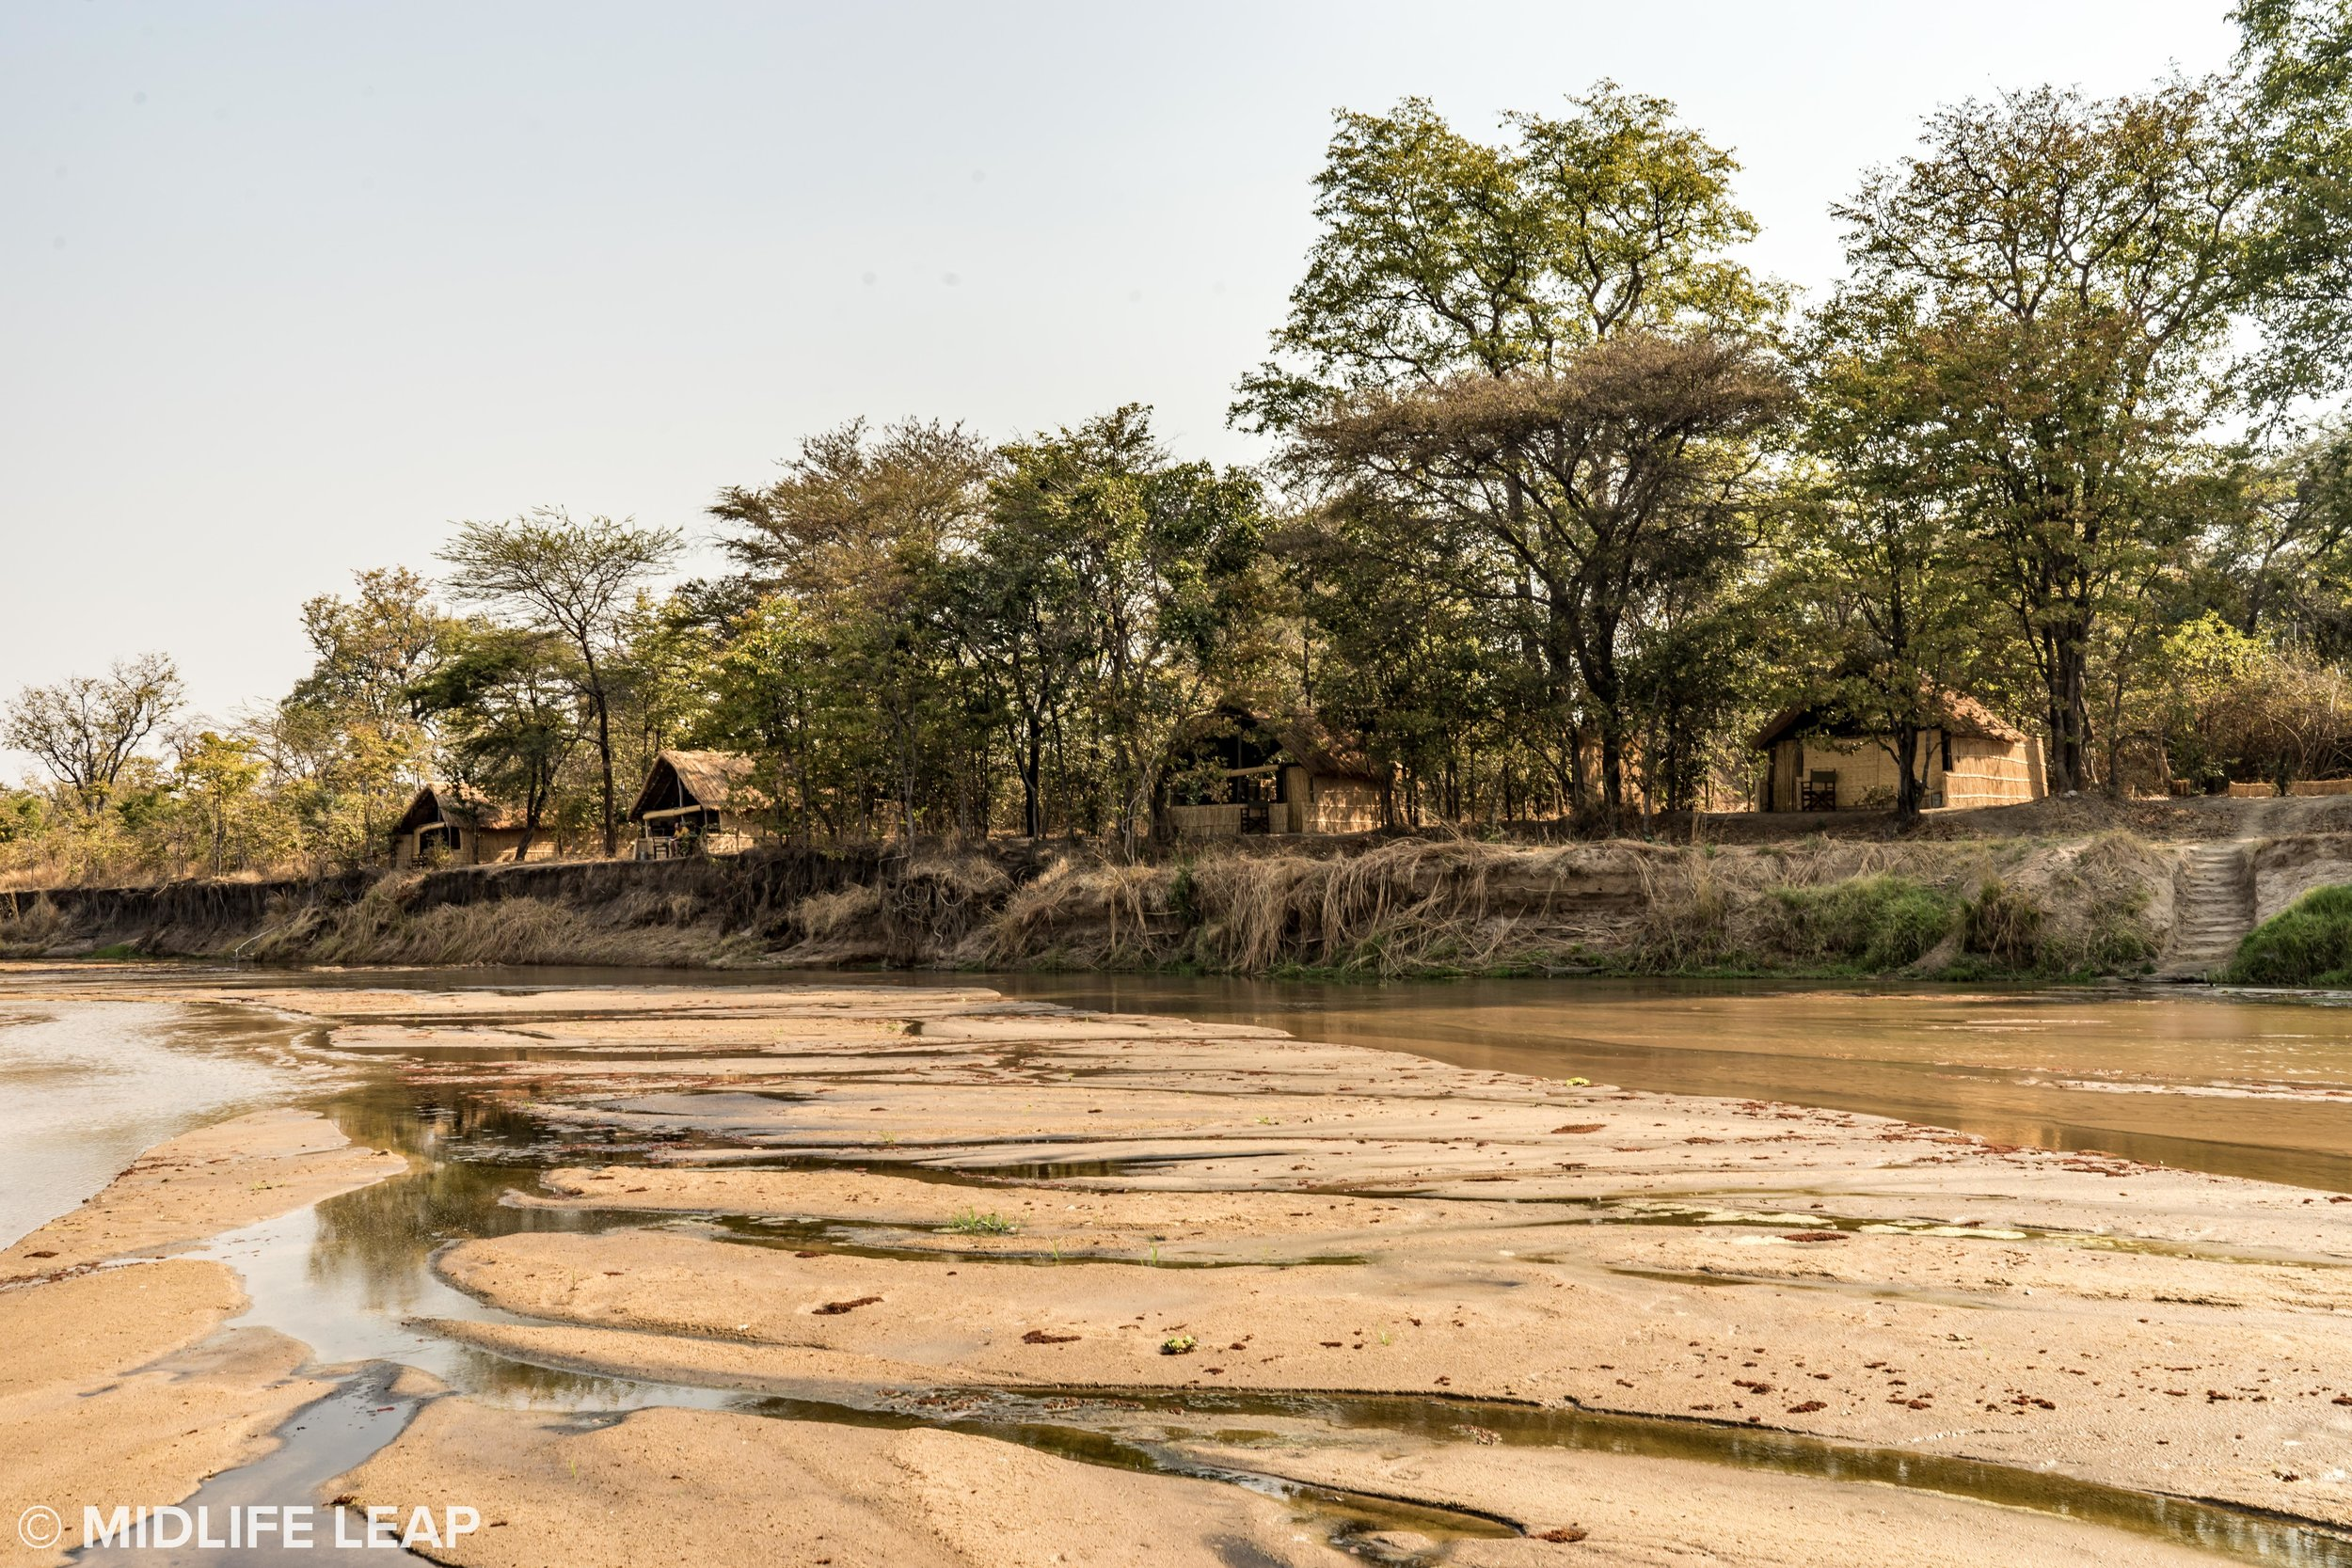 Mwaleshi blending into it's surroundings